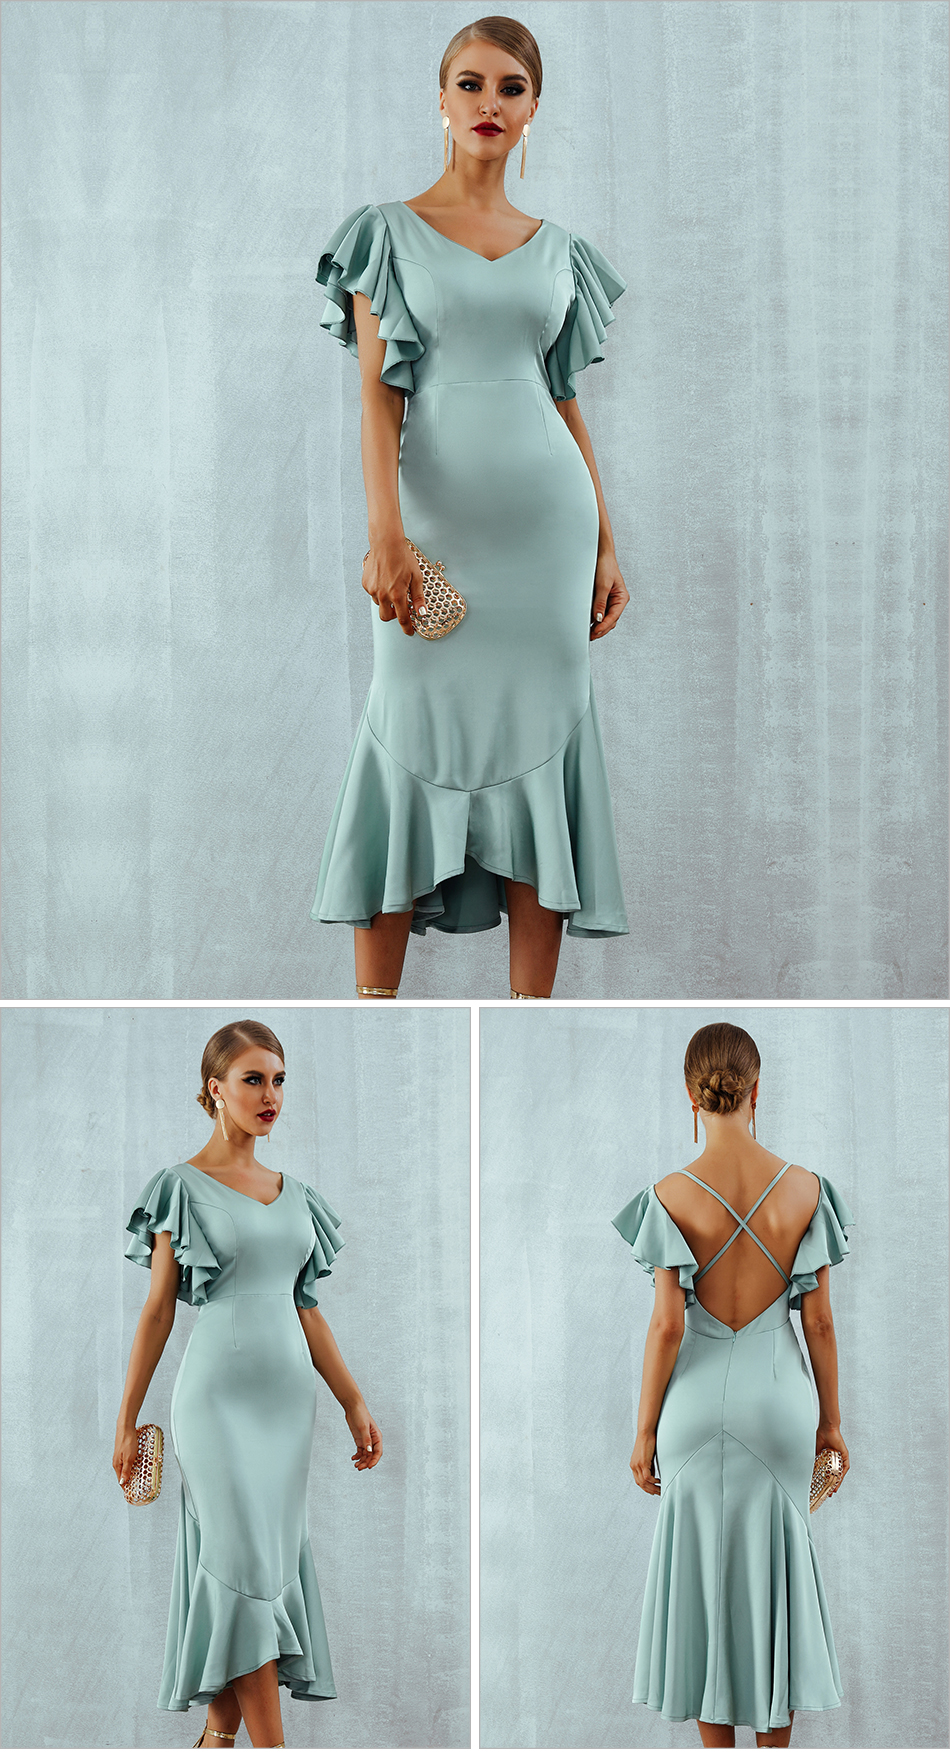 Ruffles Butterfly Sleeveless Backless Mermaid Dress